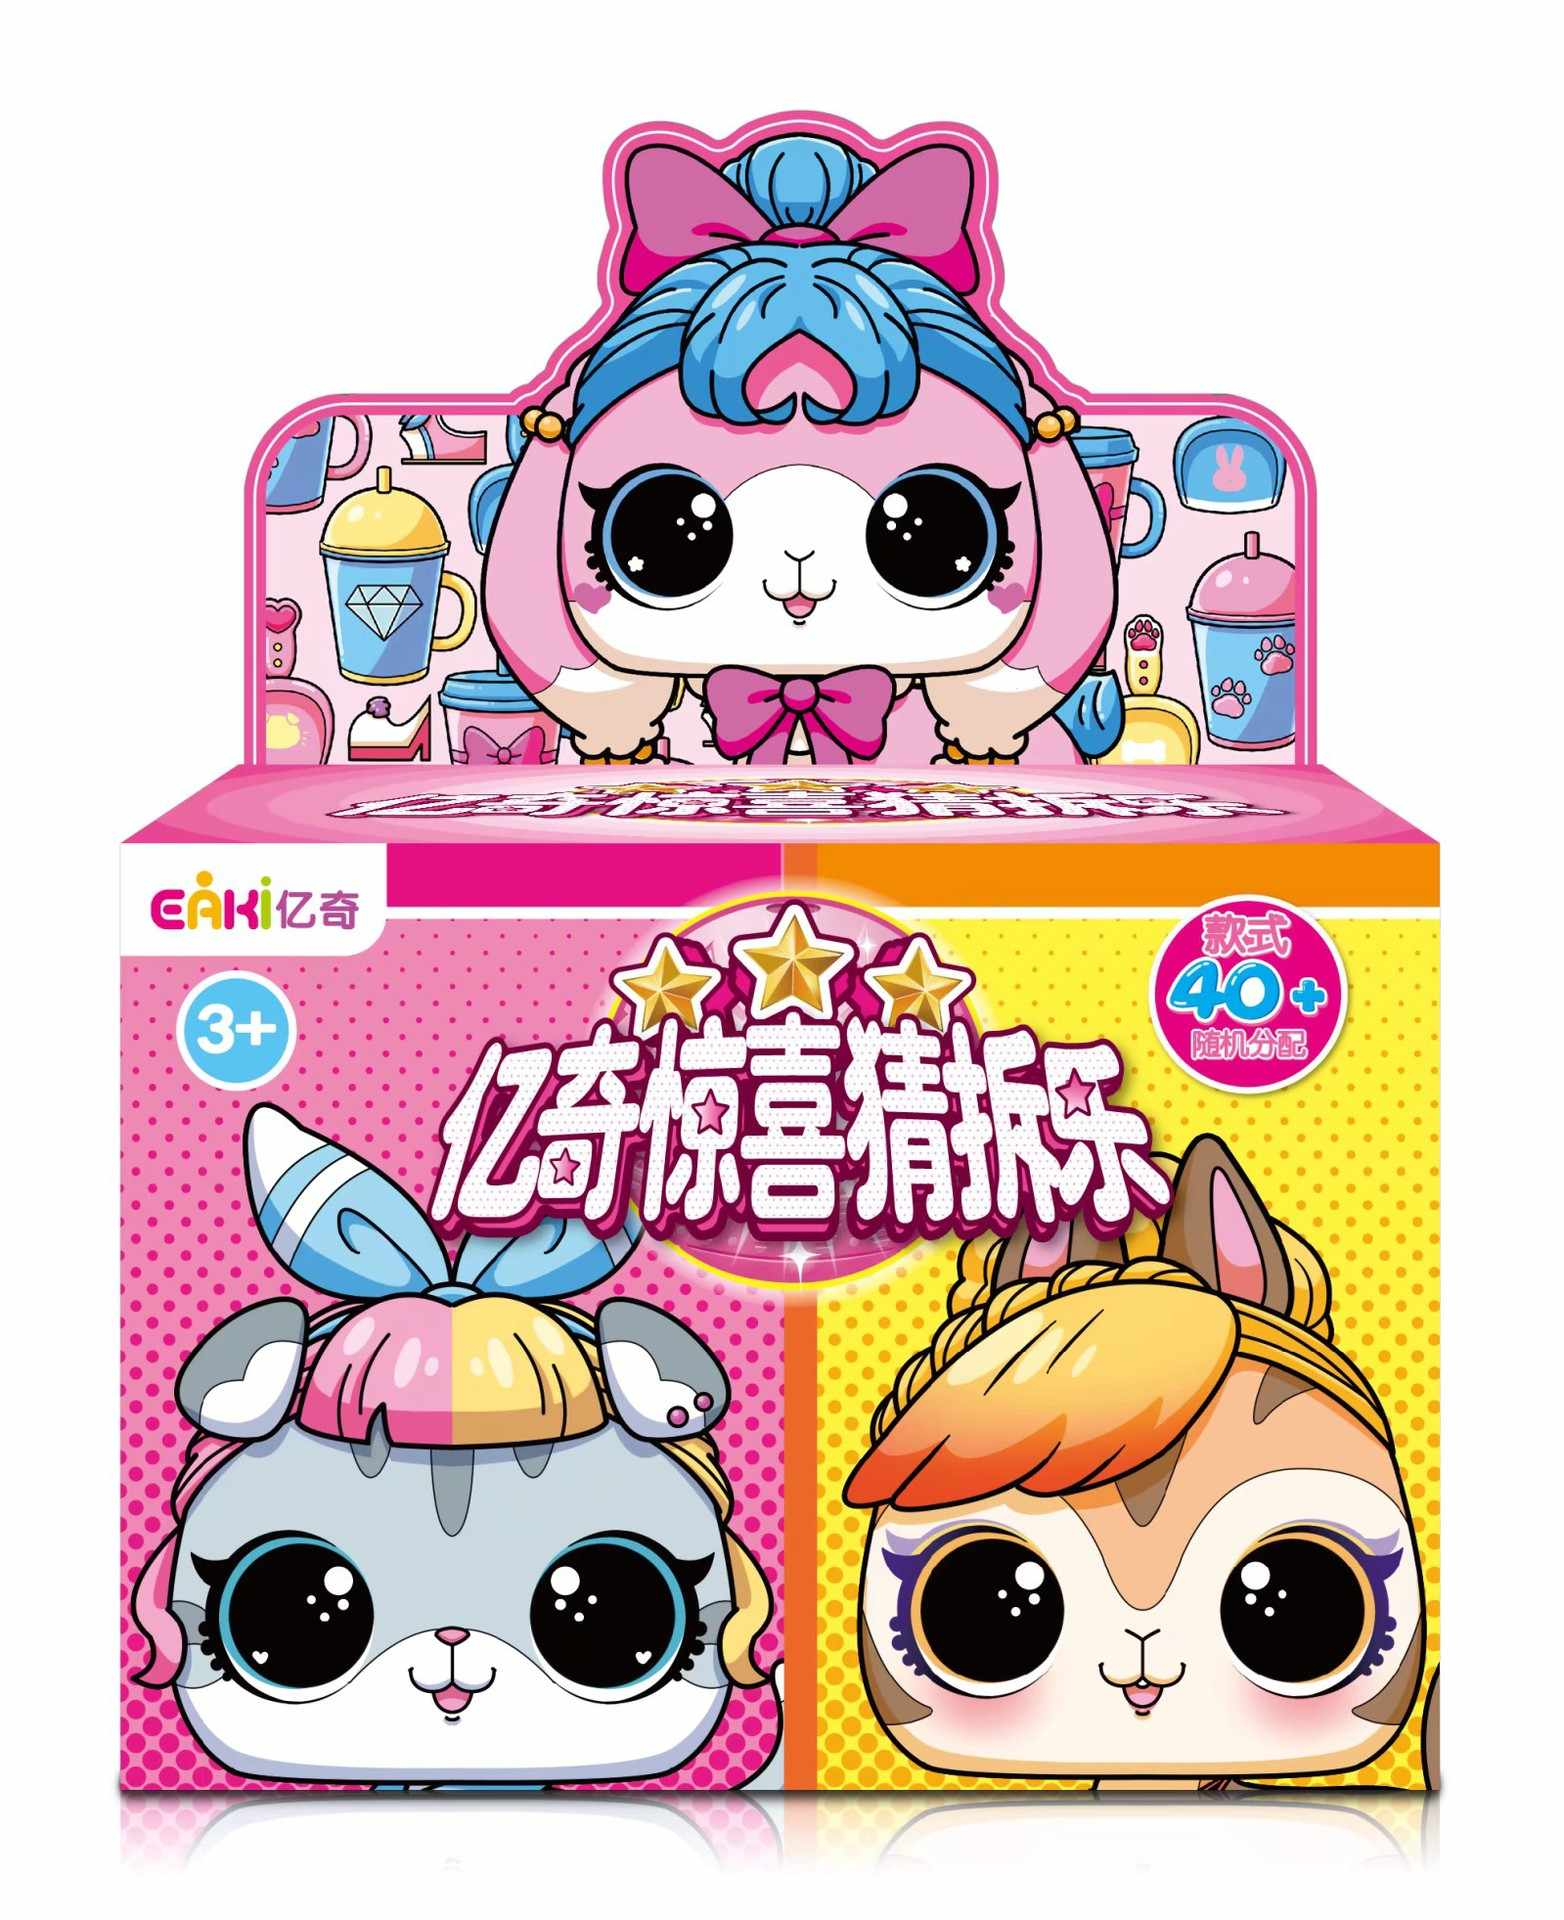 Yiqi Surprise Guess dividida música sorpresa muñeca mascota-niña DIY remplazable Casa de juego tomar cuidado juguete educativo